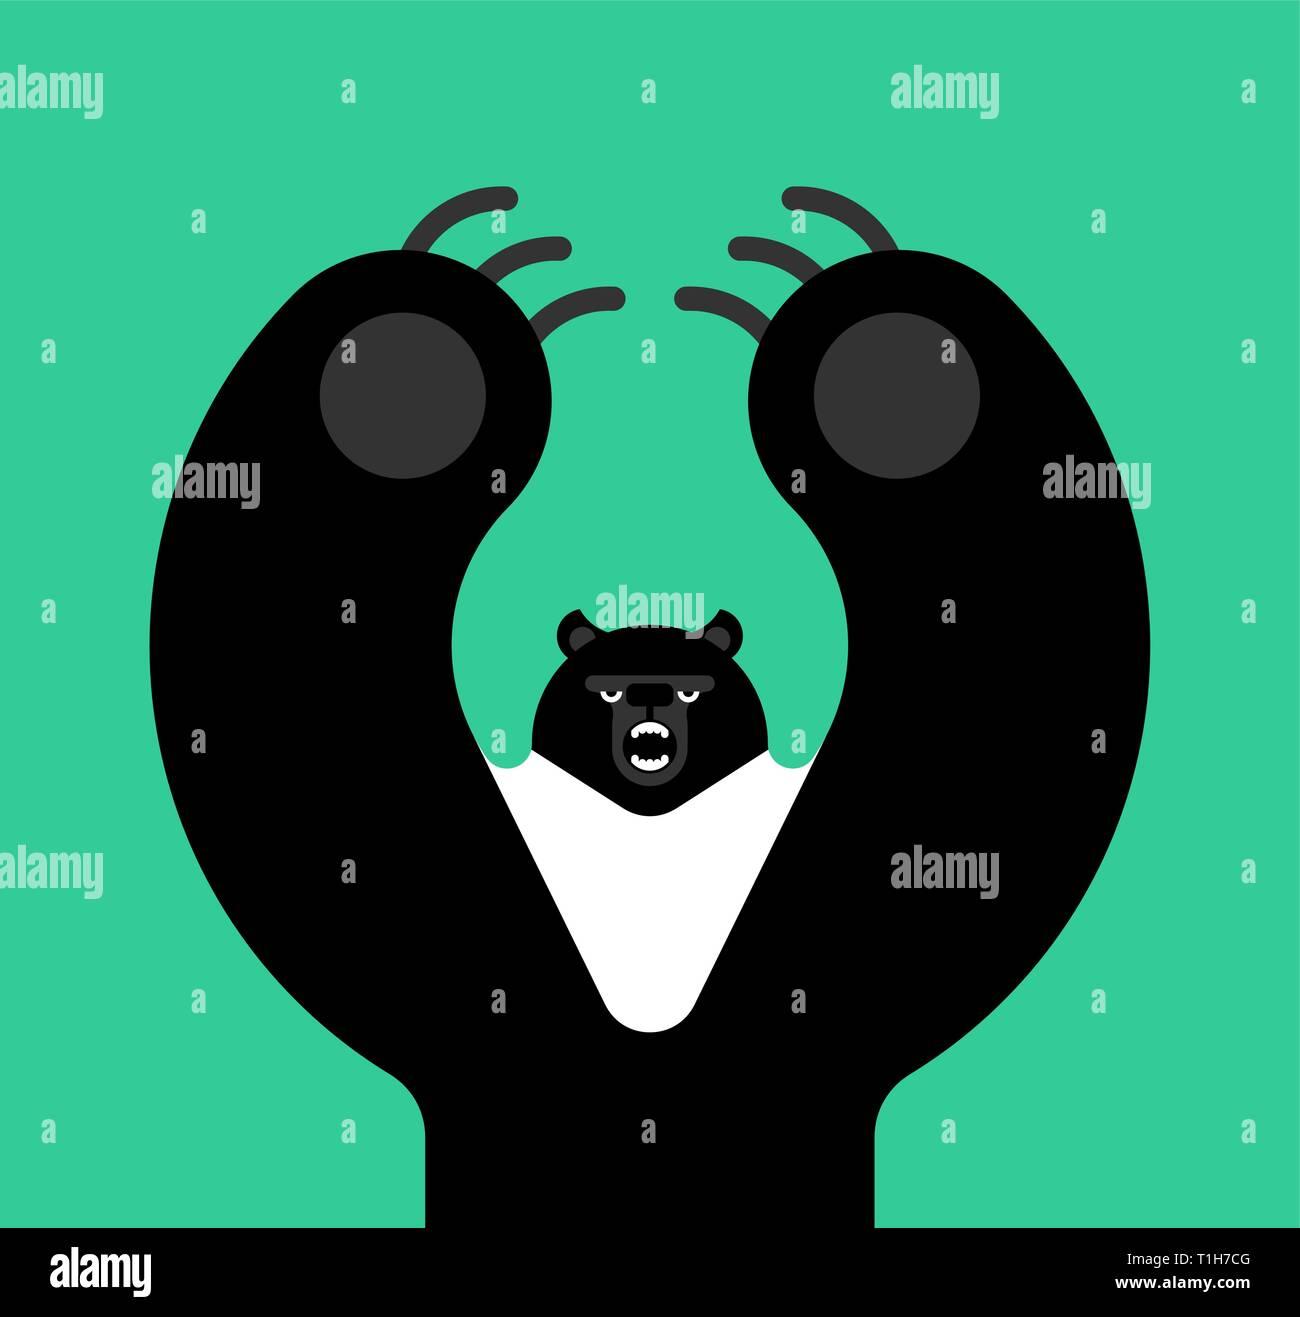 Himalayan bear black. Beast evil isolated cartoon style. big Wild predator attacks - Stock Vector